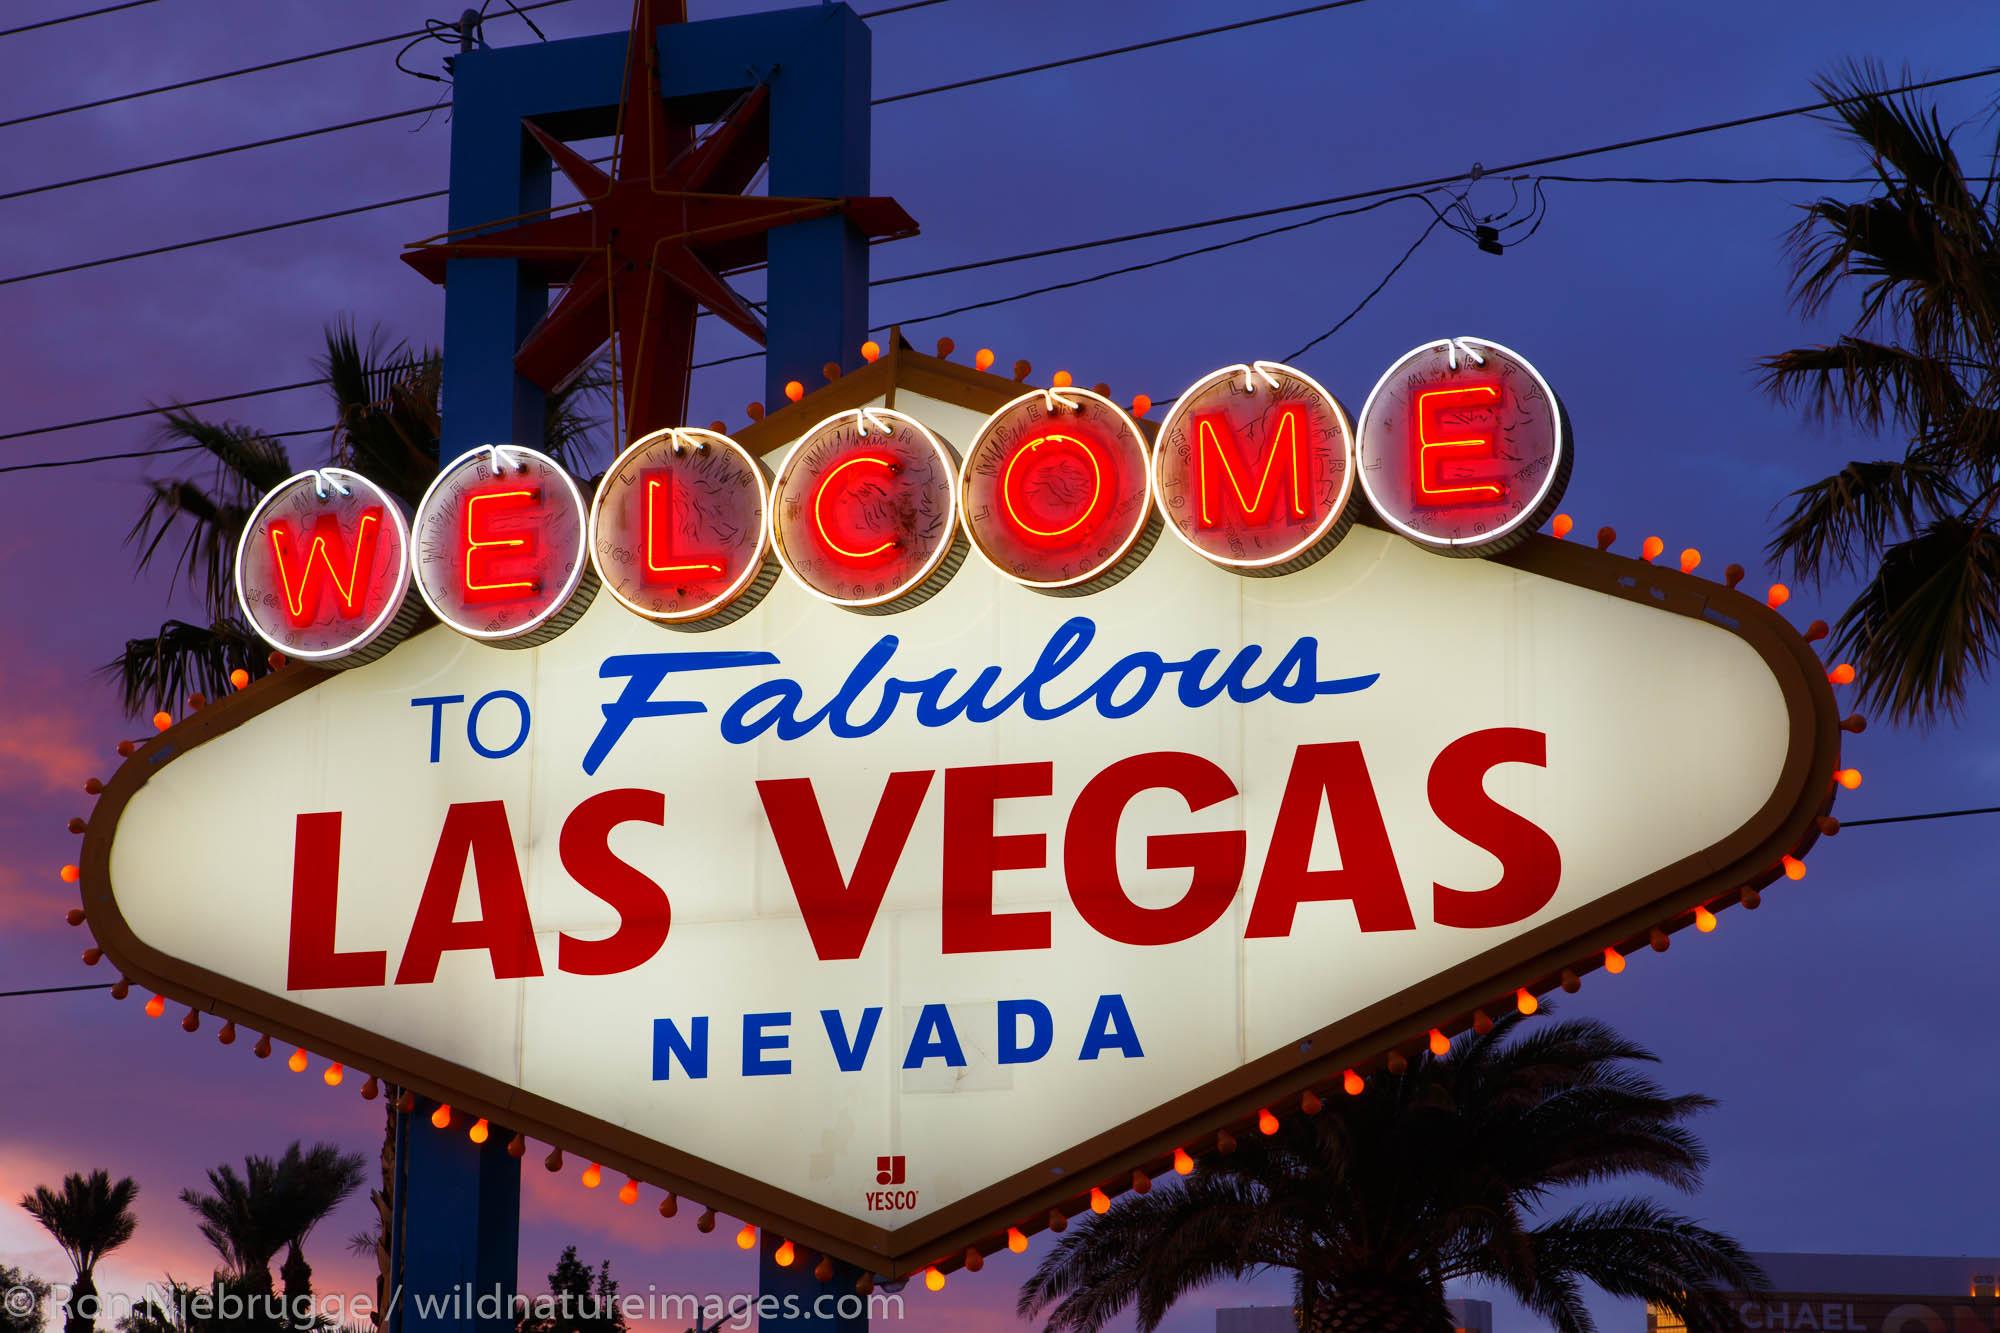 Welcome to Las Vegas sign, Las Vegas, Nevada.